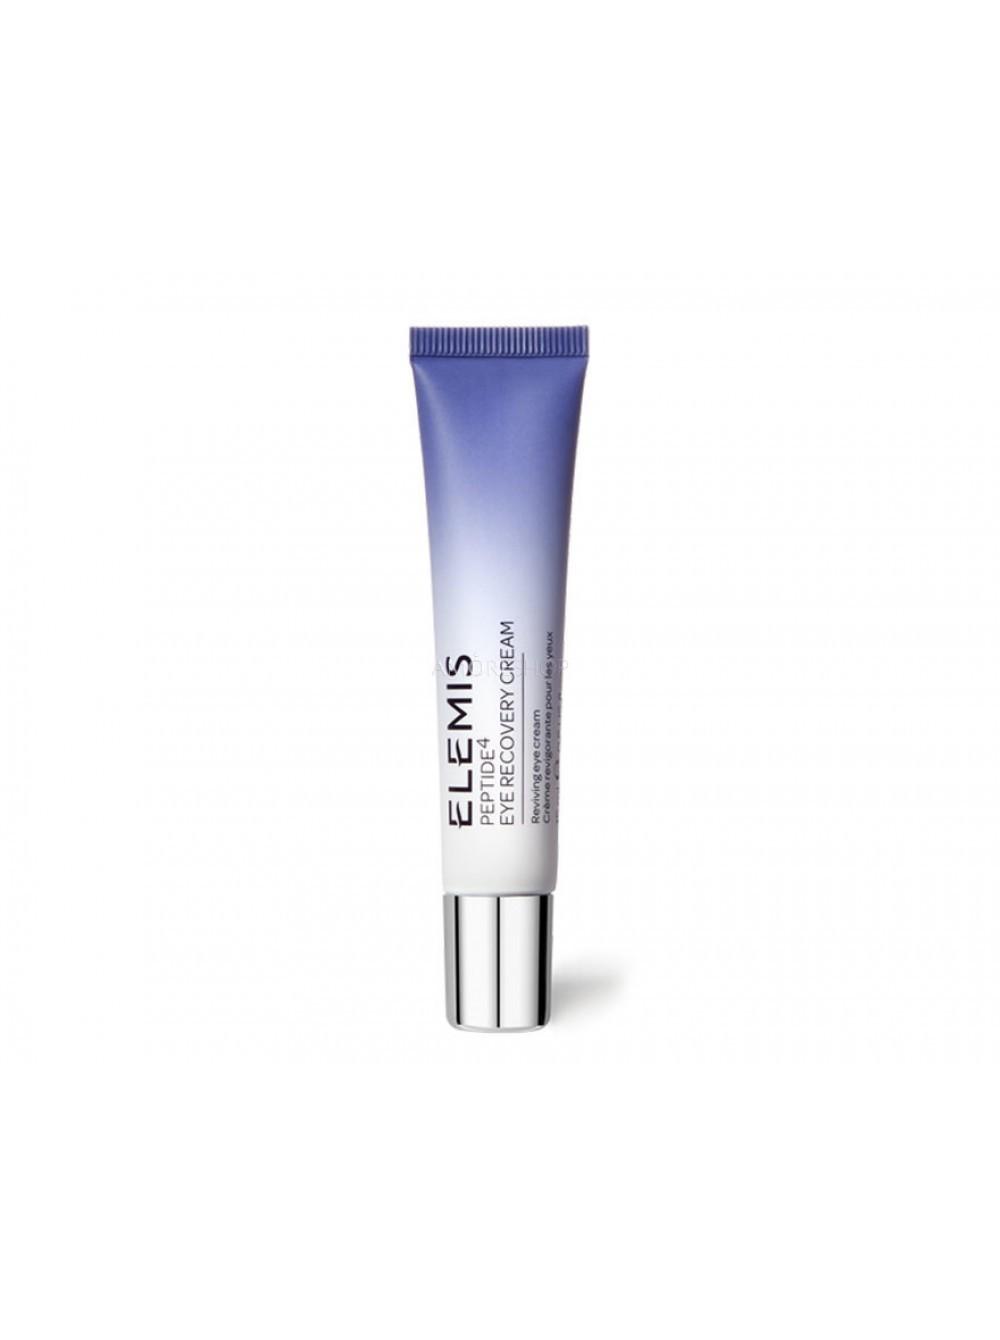 Крем вокруг глаз Elemis Peptide 4 Eye Recovery Cream 15 мл